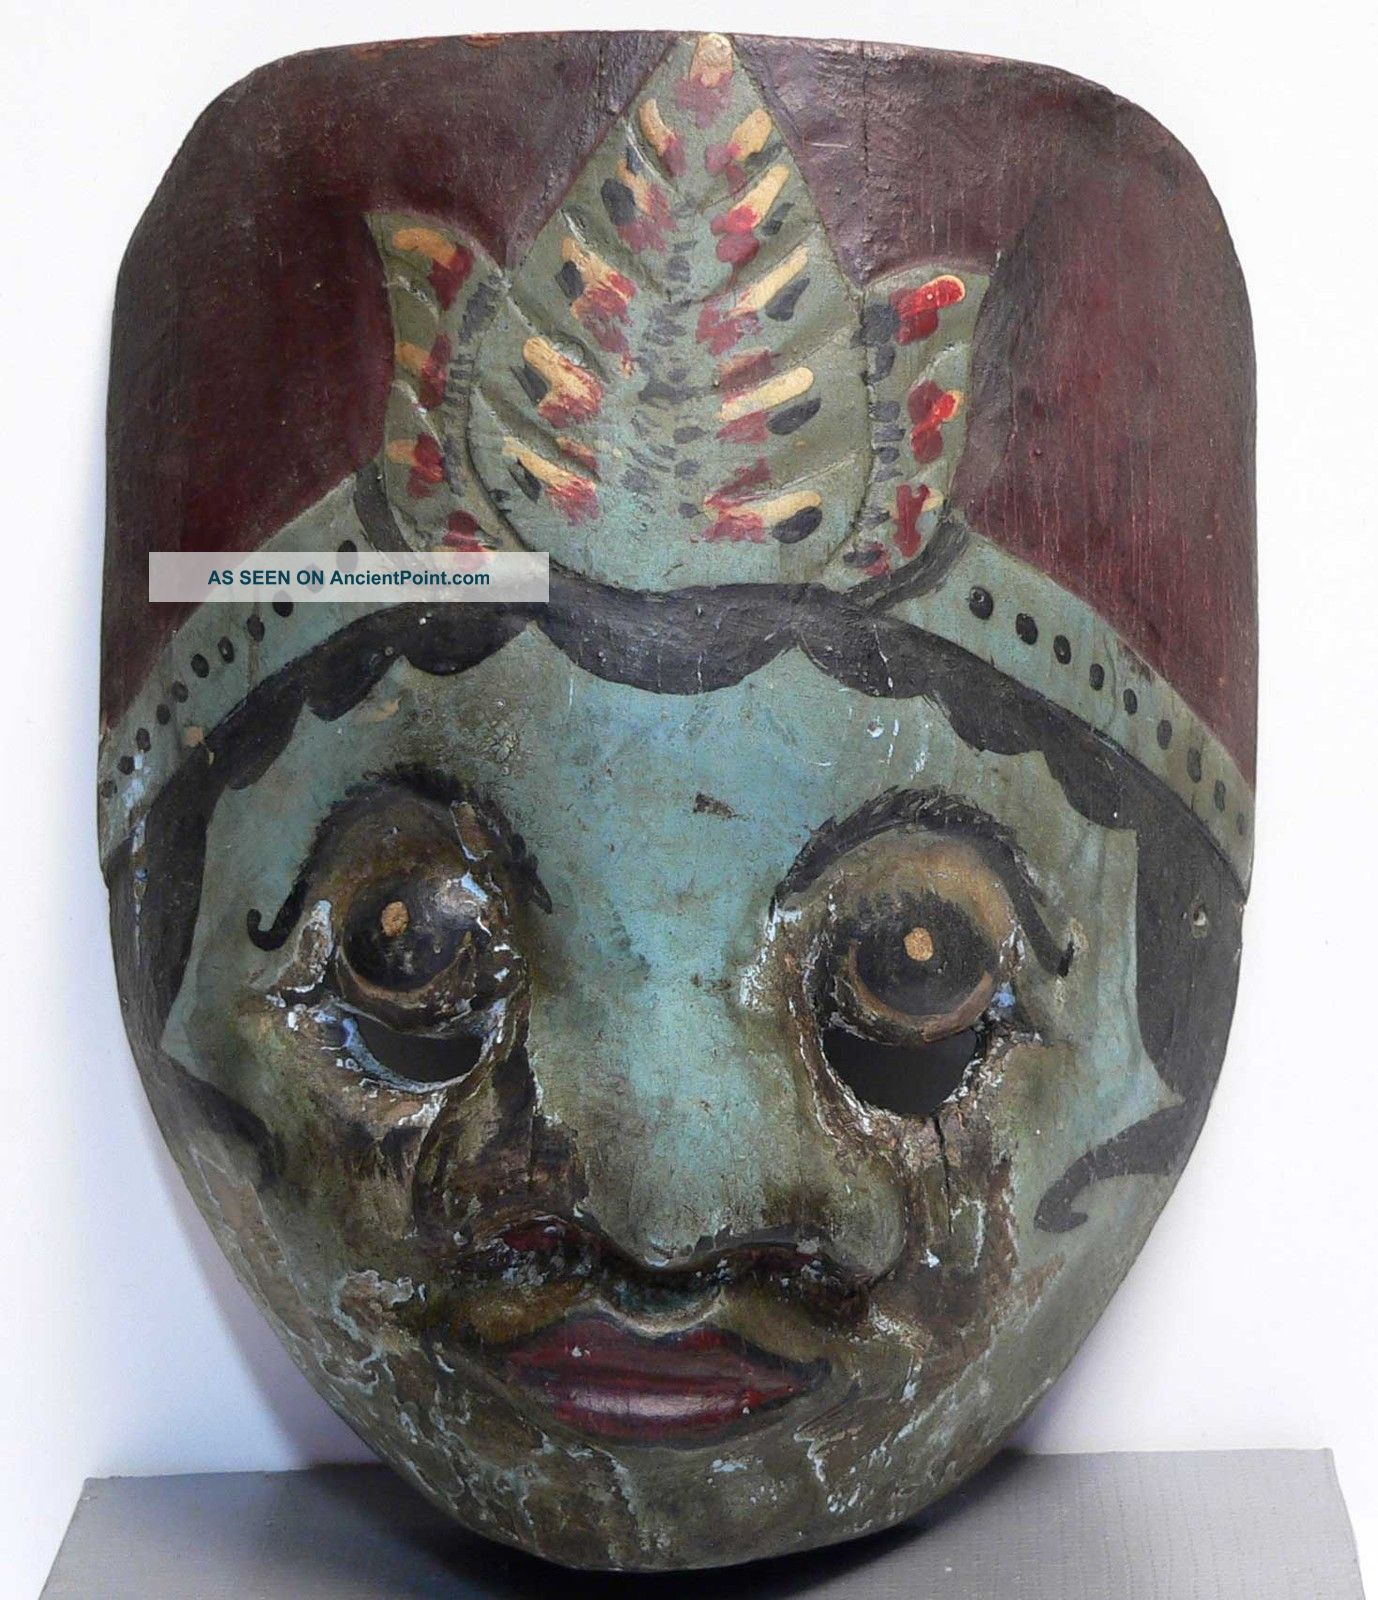 Old Wayang Mask Topeng Wajang Keris Tribe Art Indonesia Pacific Islands & Oceania photo